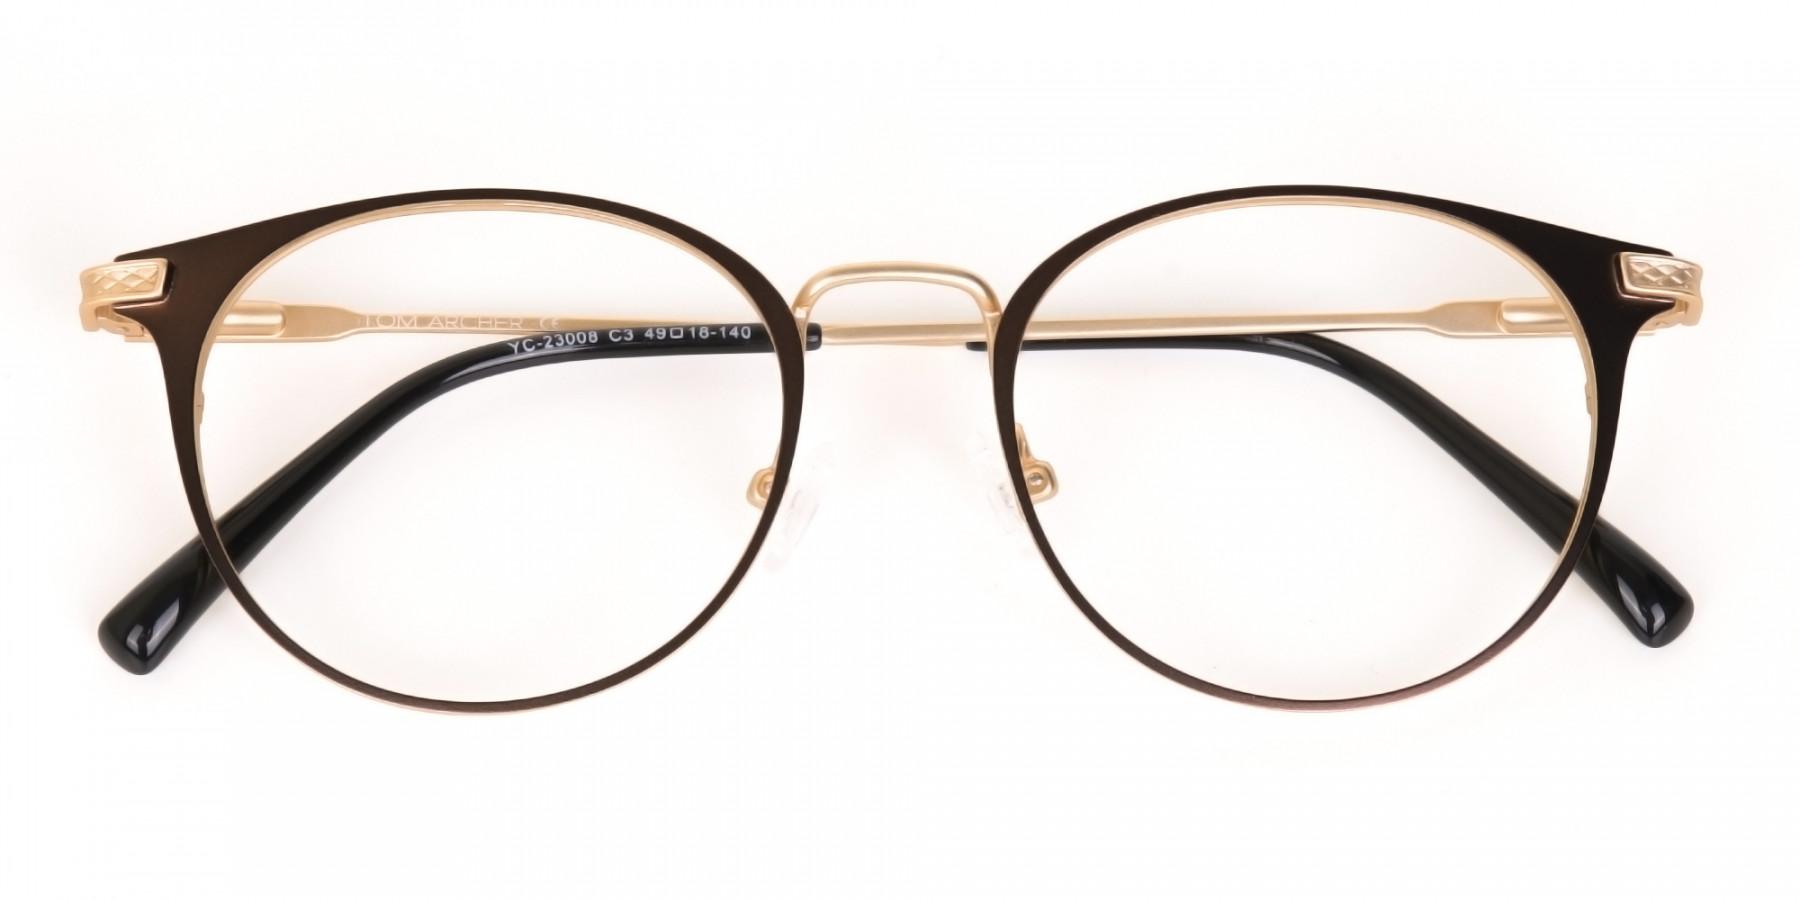 Dark Mocha Brown and Gold Round Glasses Unisex-1